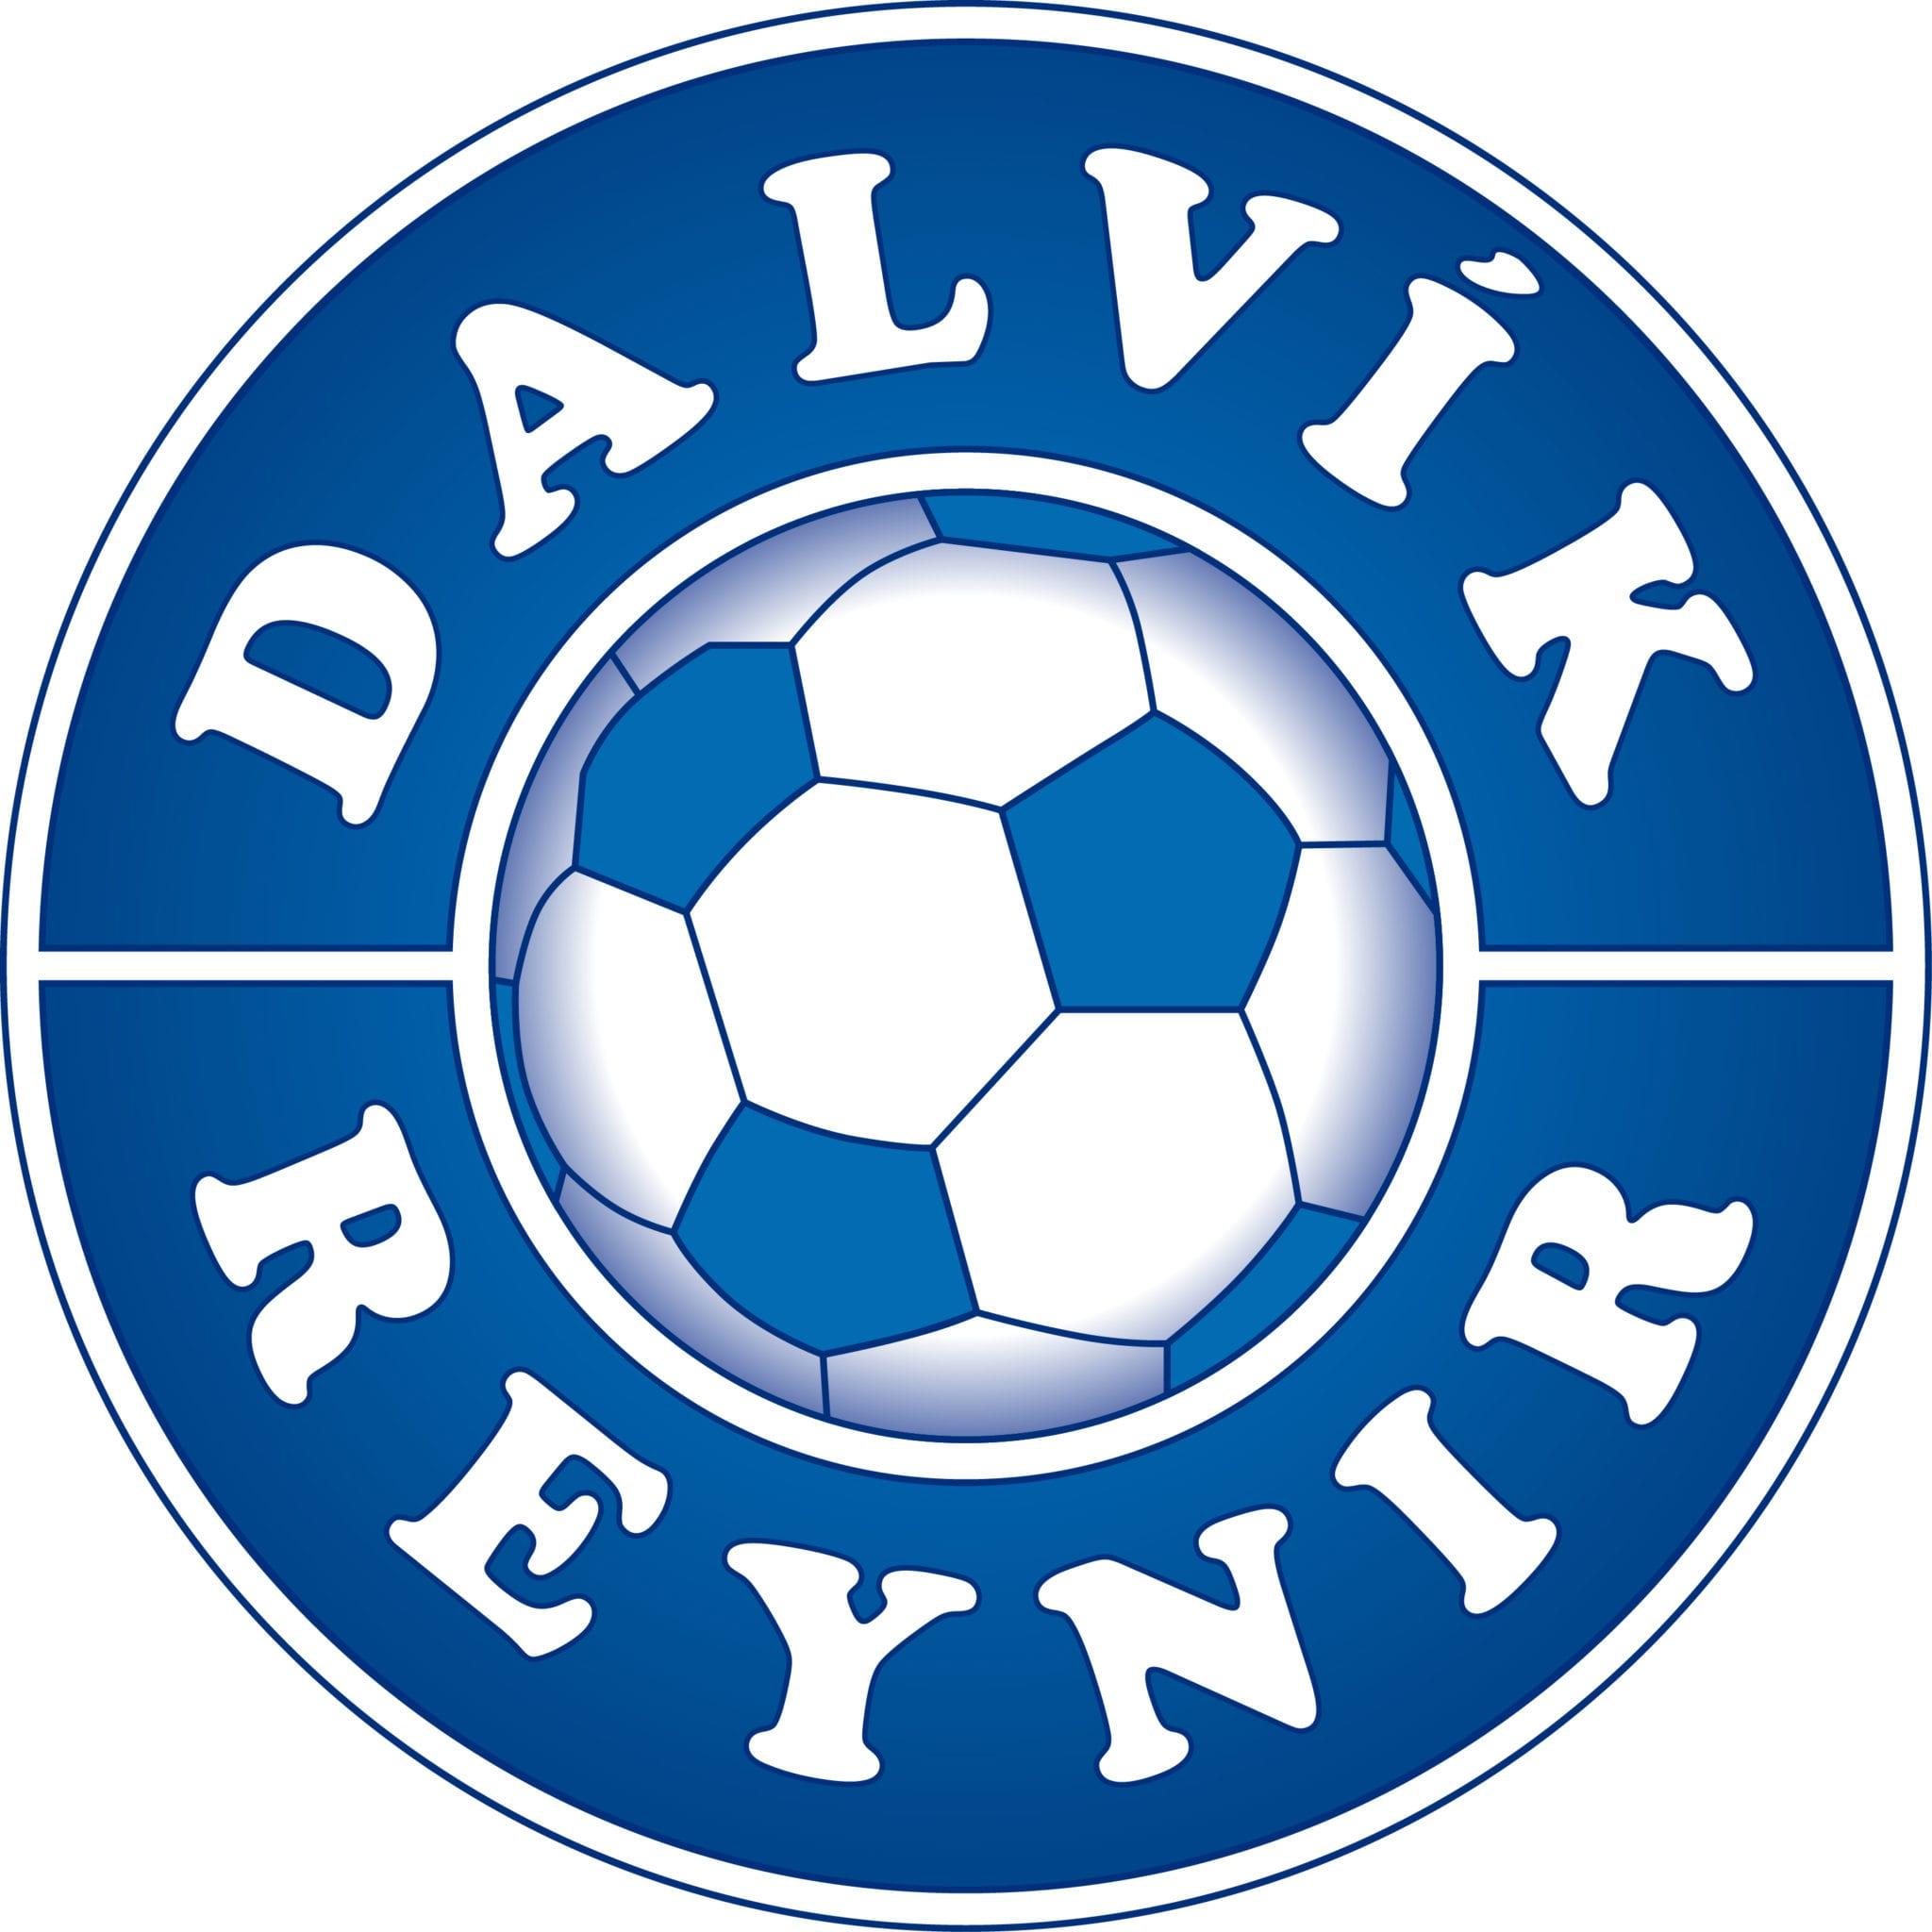 Merki Dalvík/Reynir